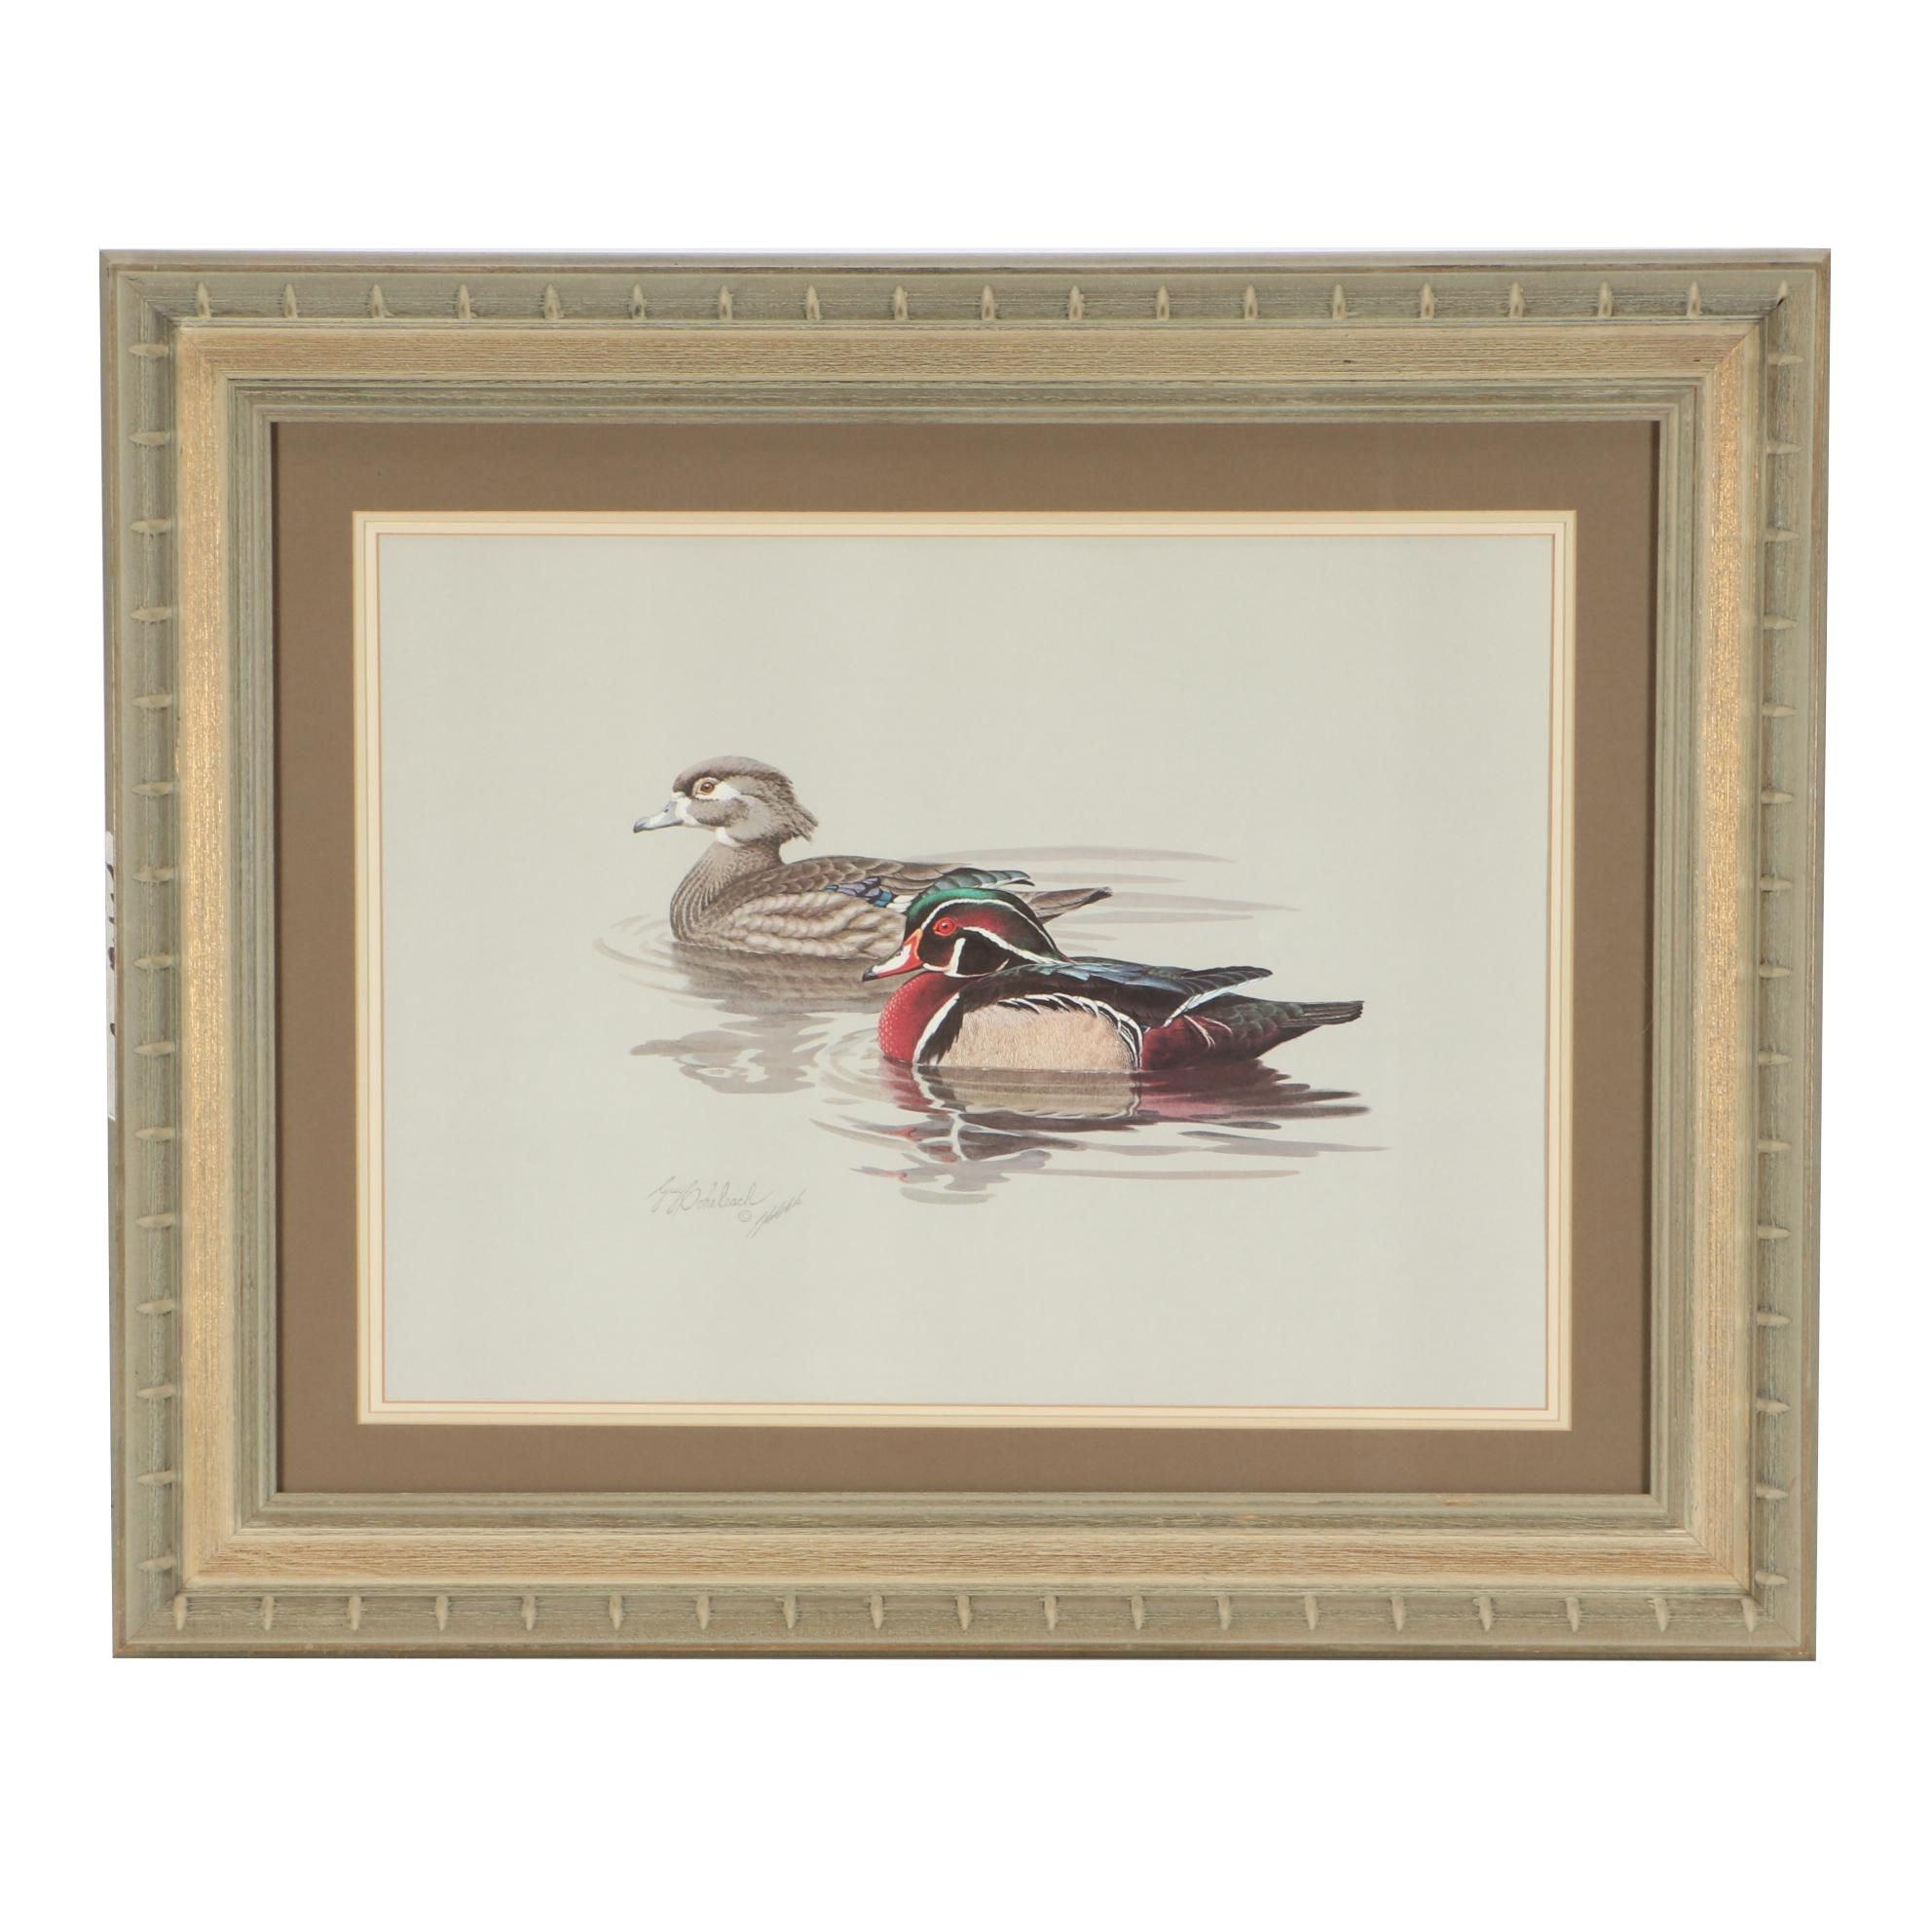 Guy Coleheach Offset Lithograph Print of Wood Ducks